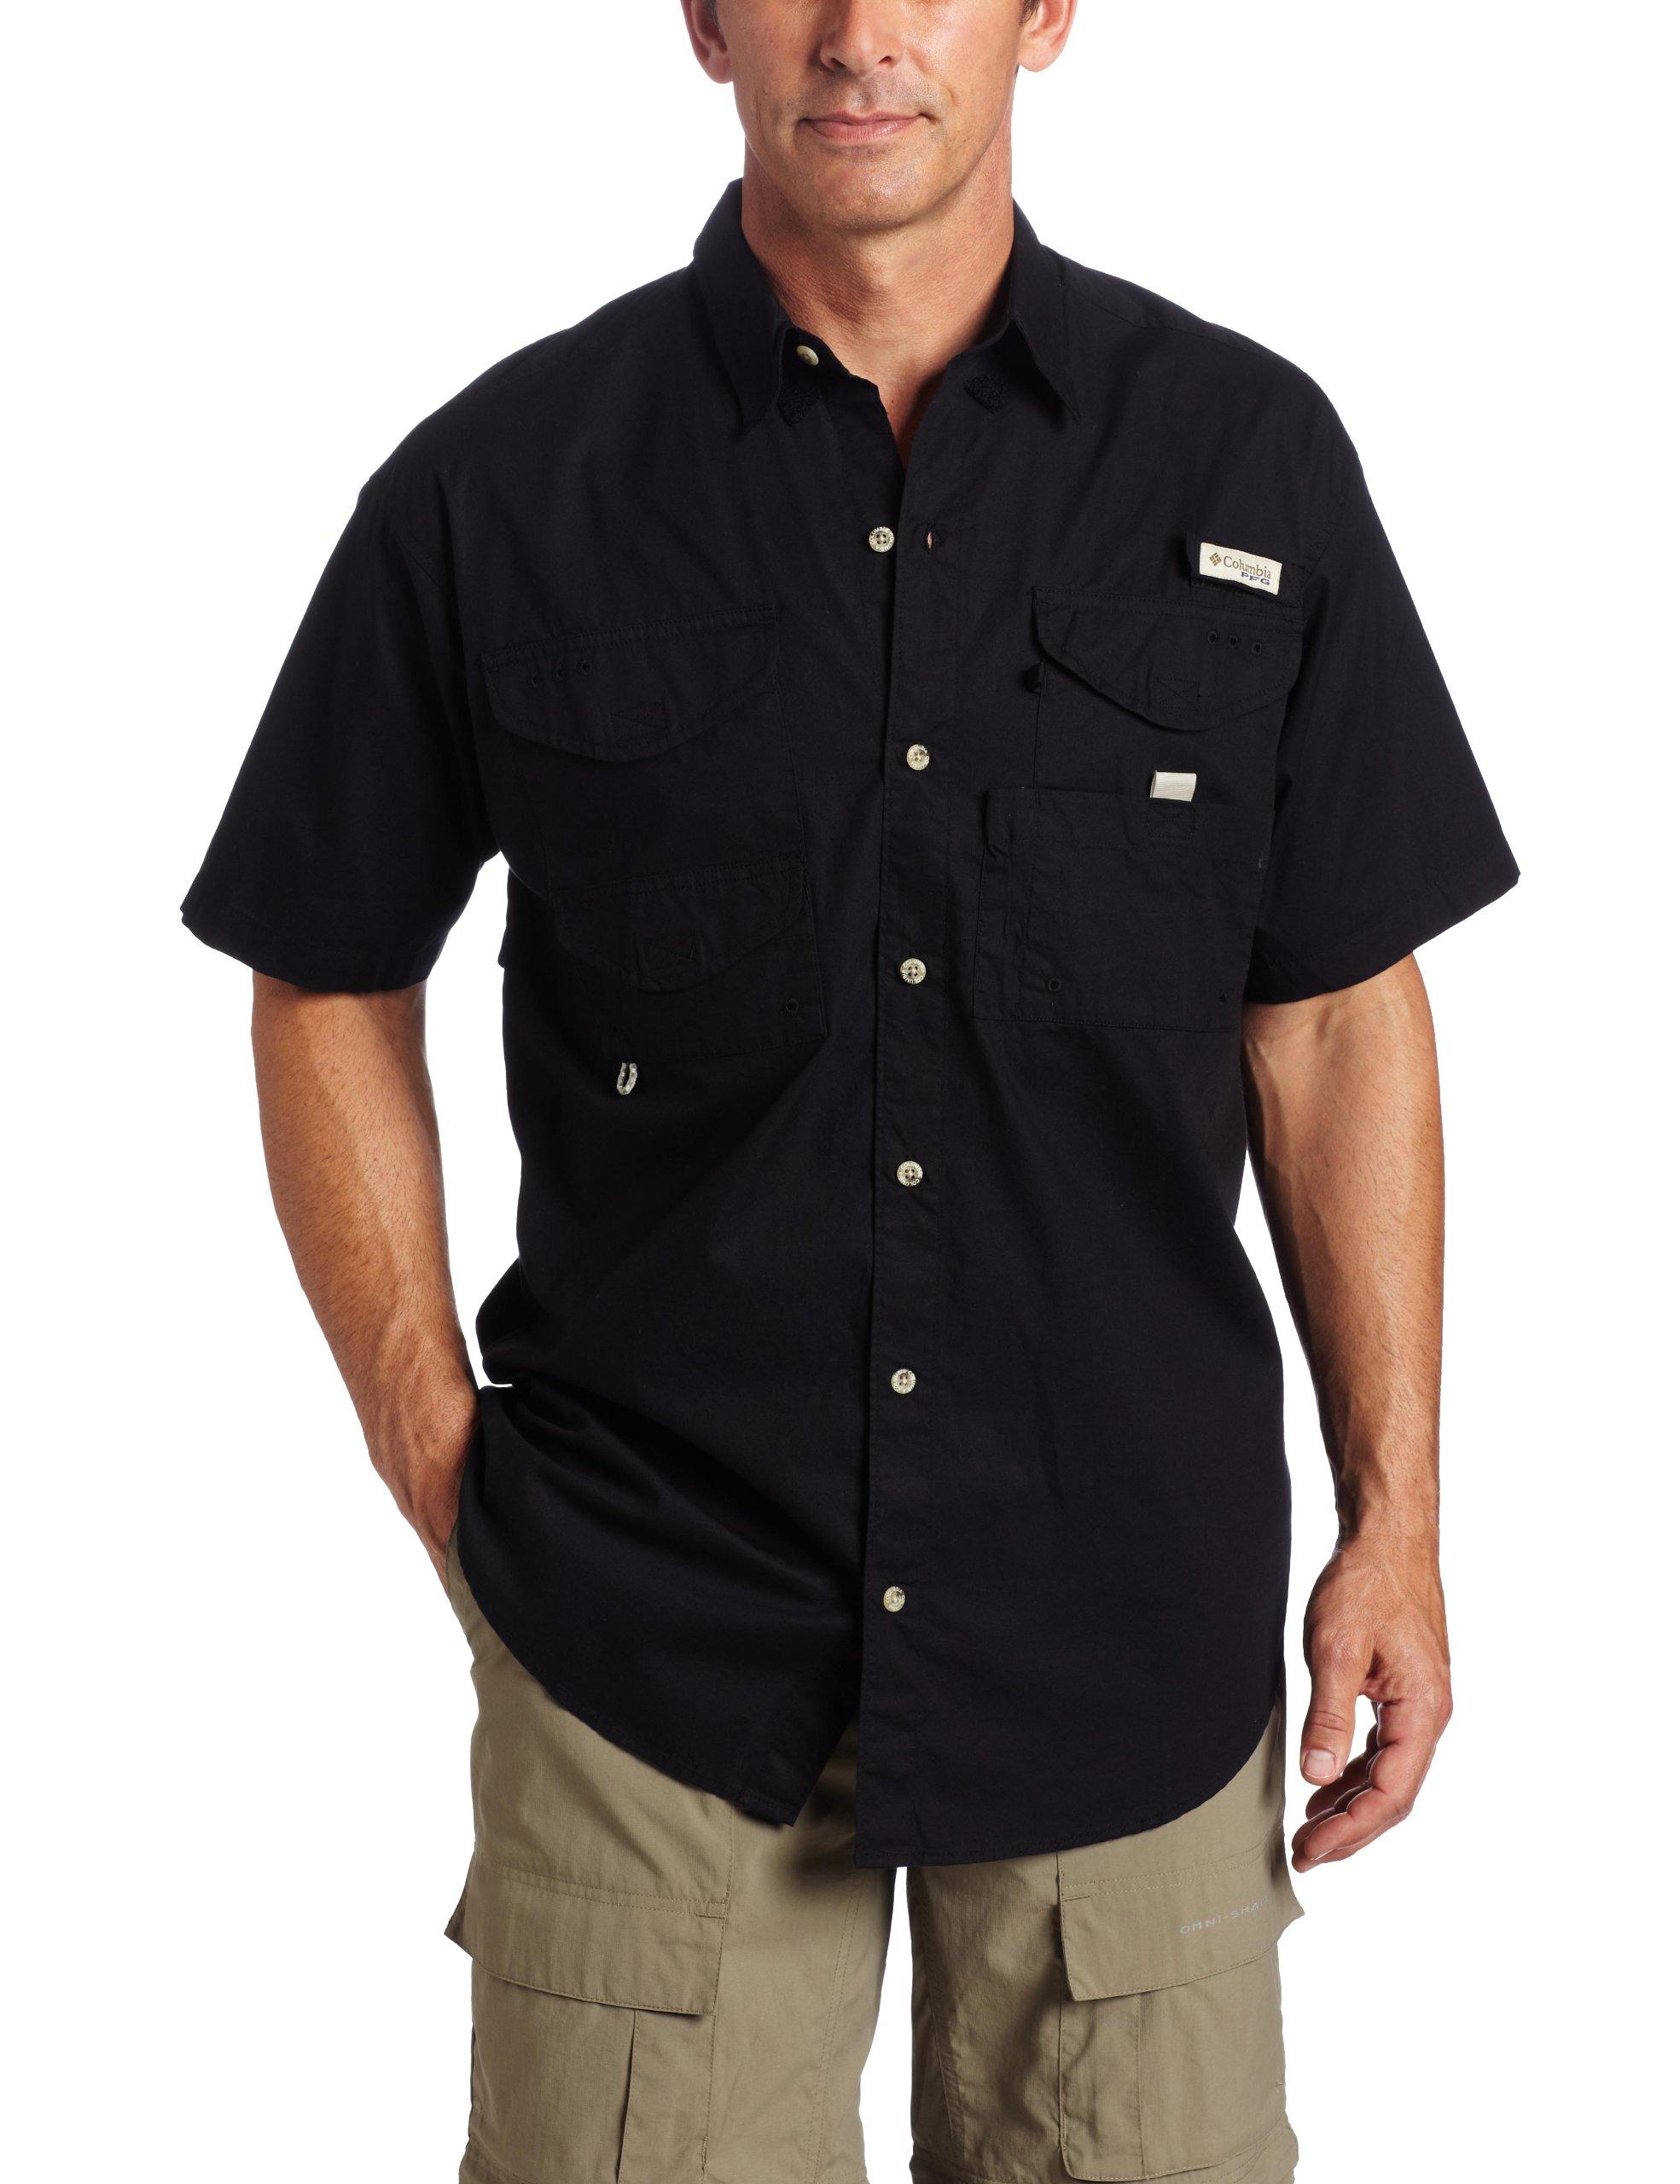 Columbia Men's Bonehead Short-Sleeve Work Shirt, Comfortable and Breathable